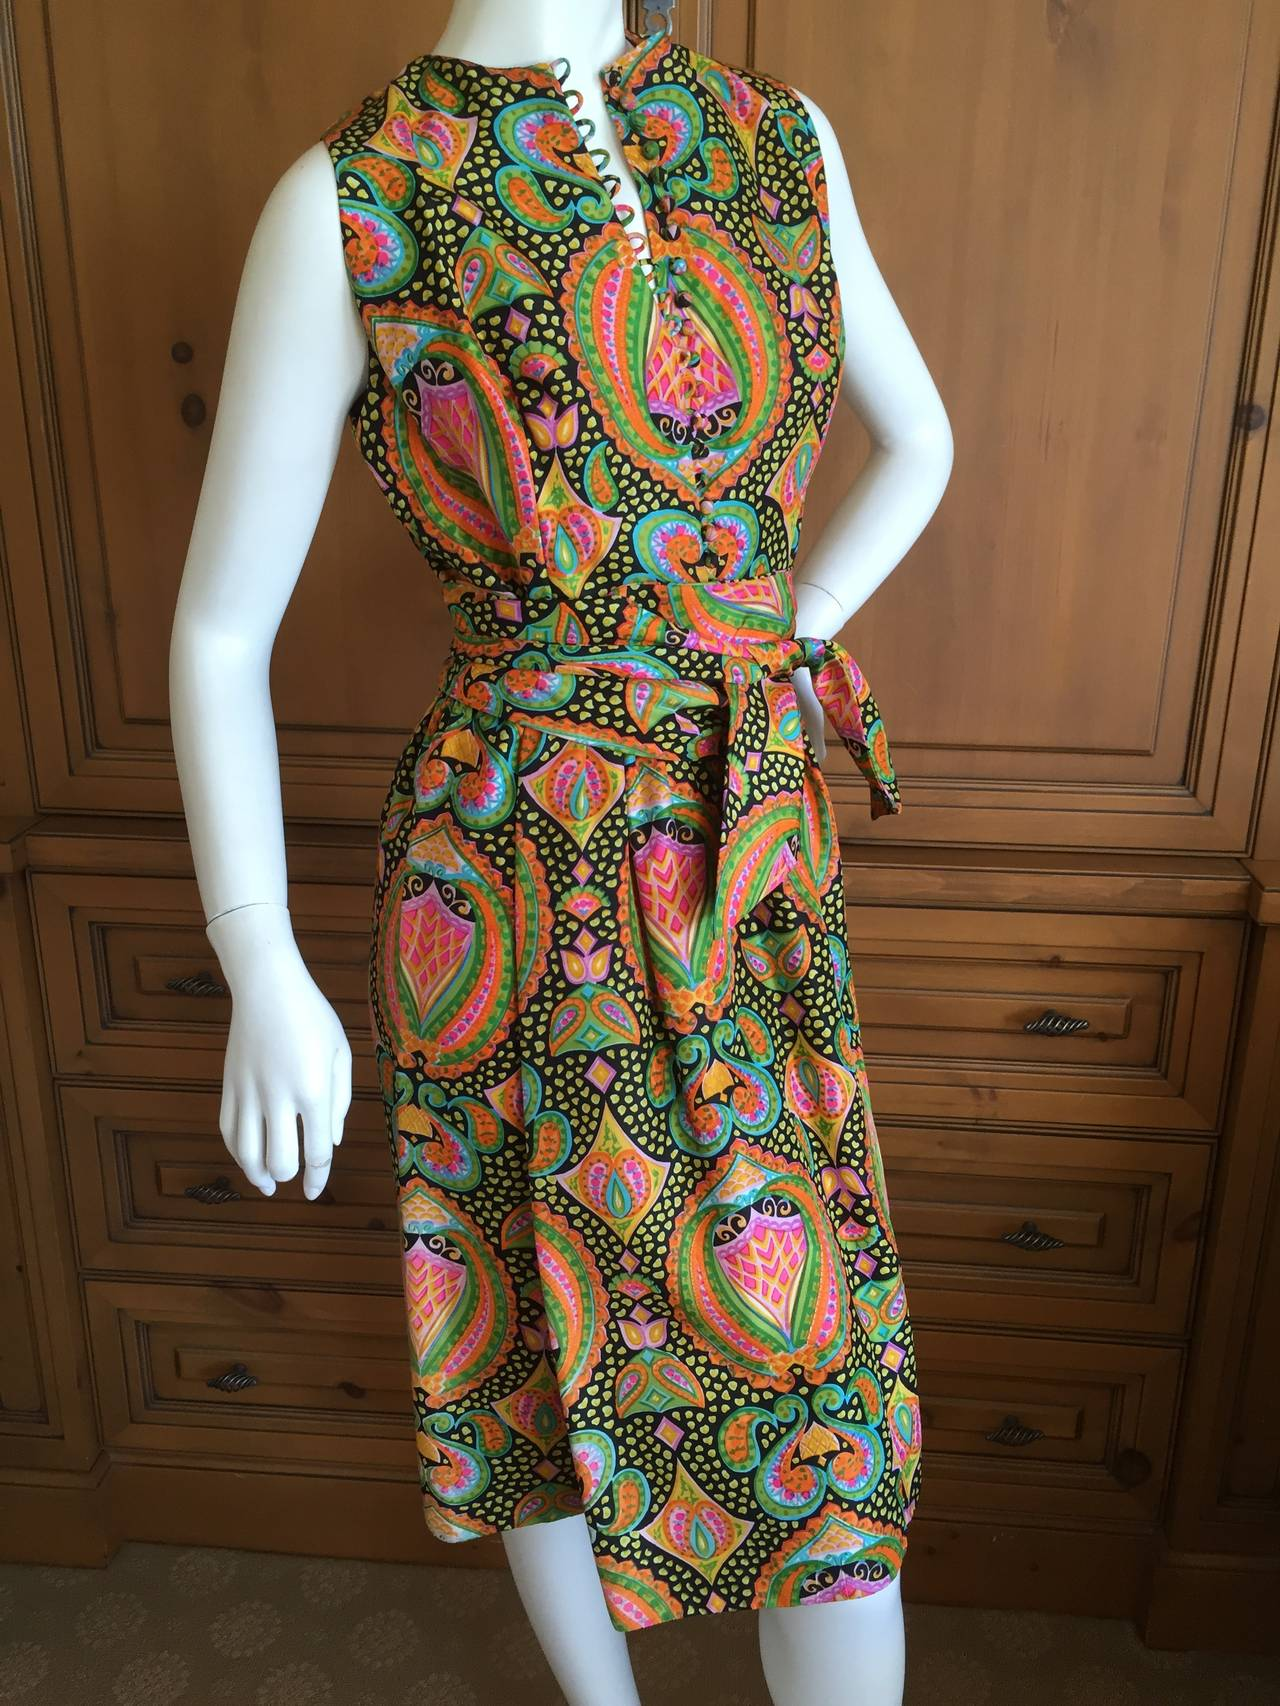 Geoffrey Beene 1970's Sleeveless Silk Dress with Sash 3